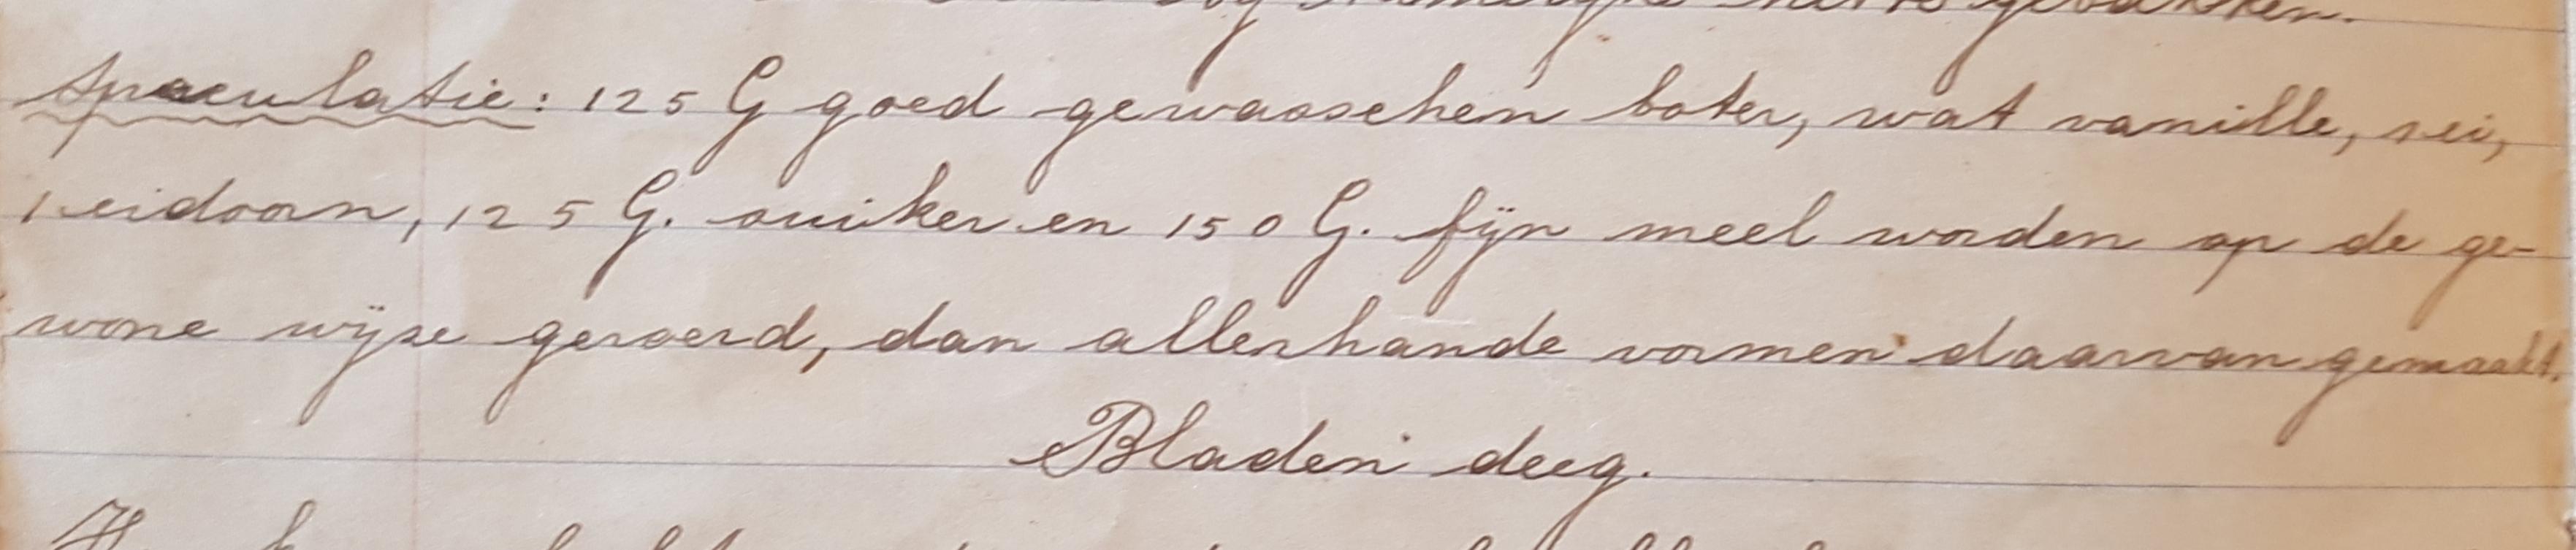 Recept speculatie 1914